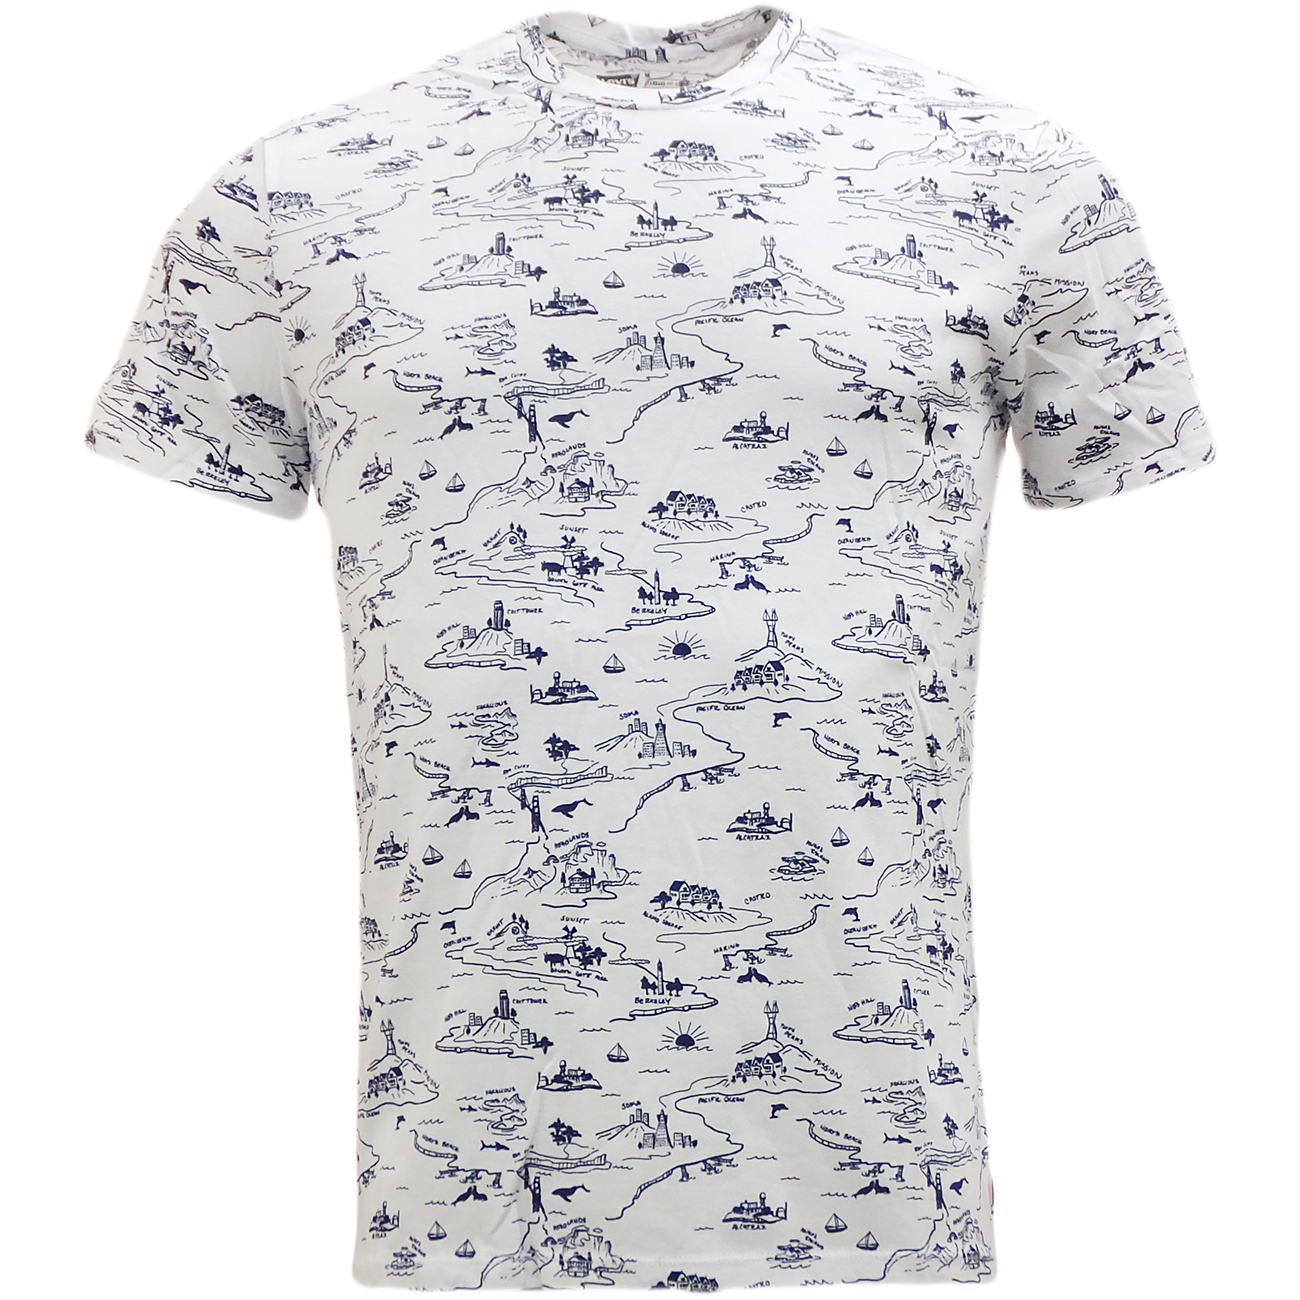 Levi Strauss Graphic T Shirt All Over Print White Ebay